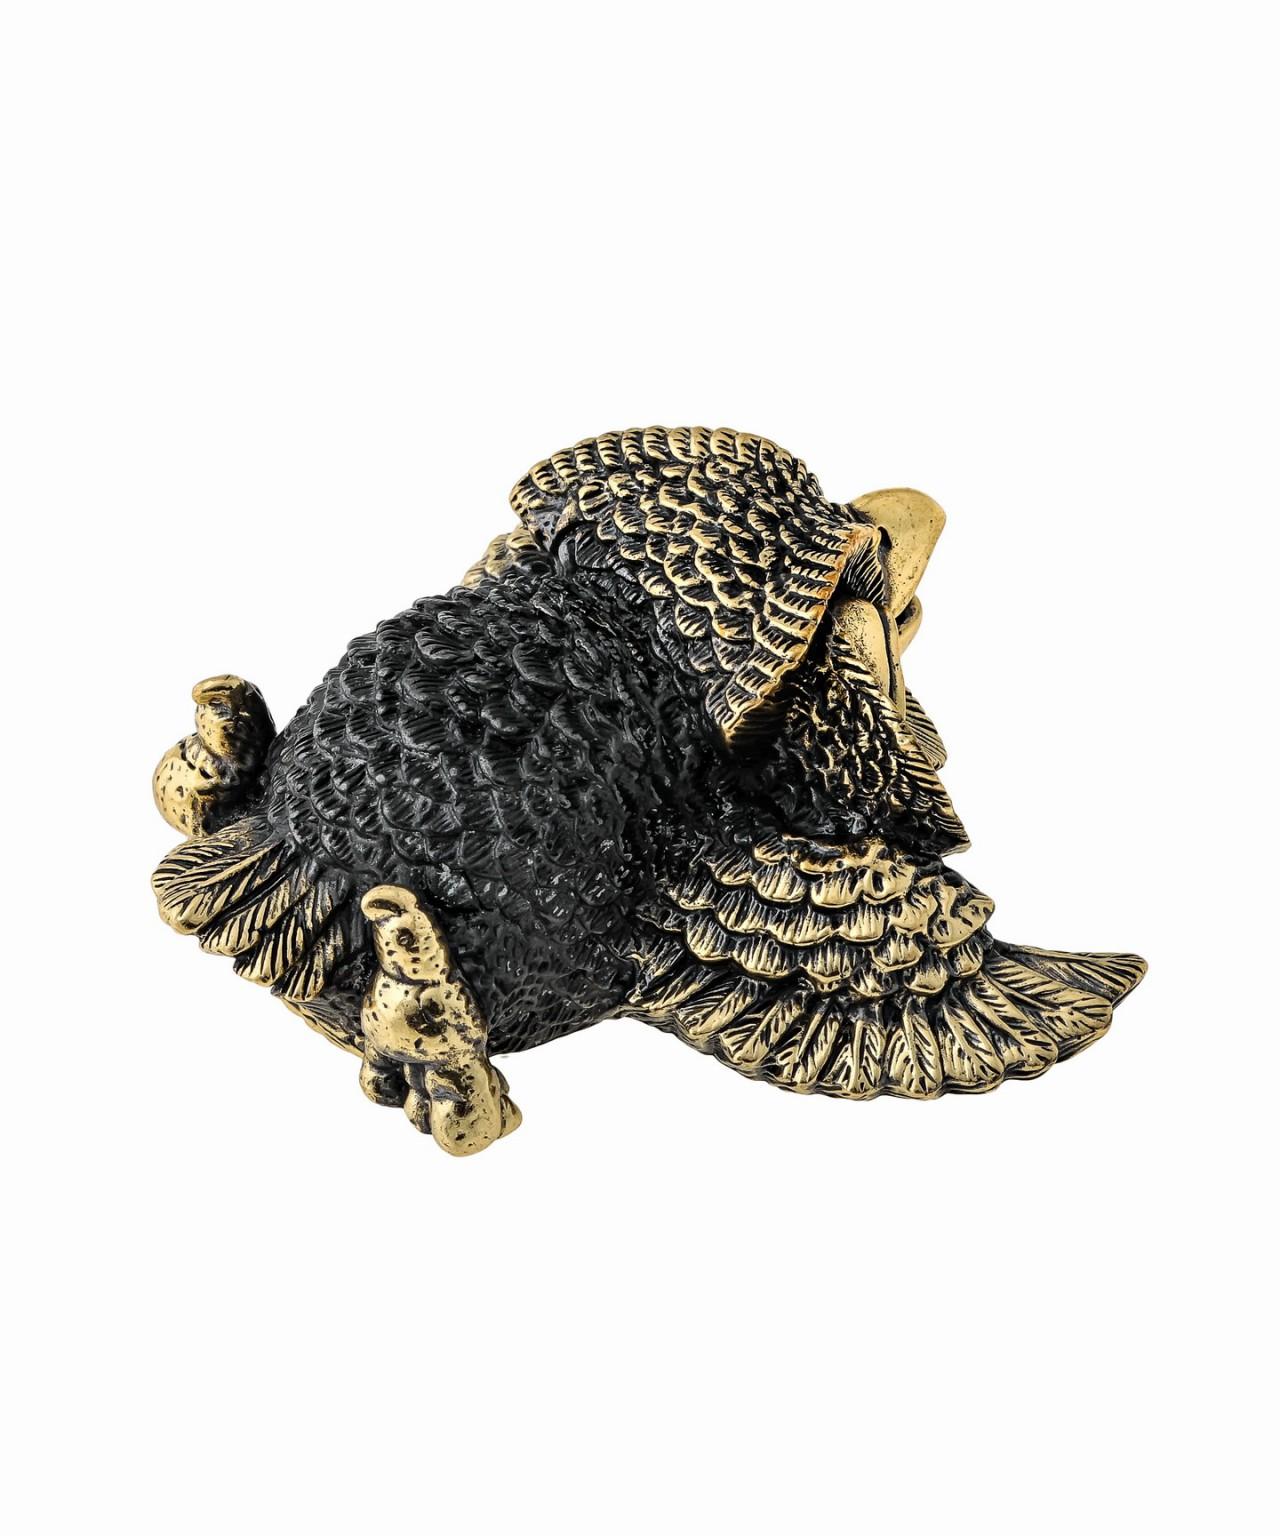 Птица Сова лежащая без подставки 1352 .1